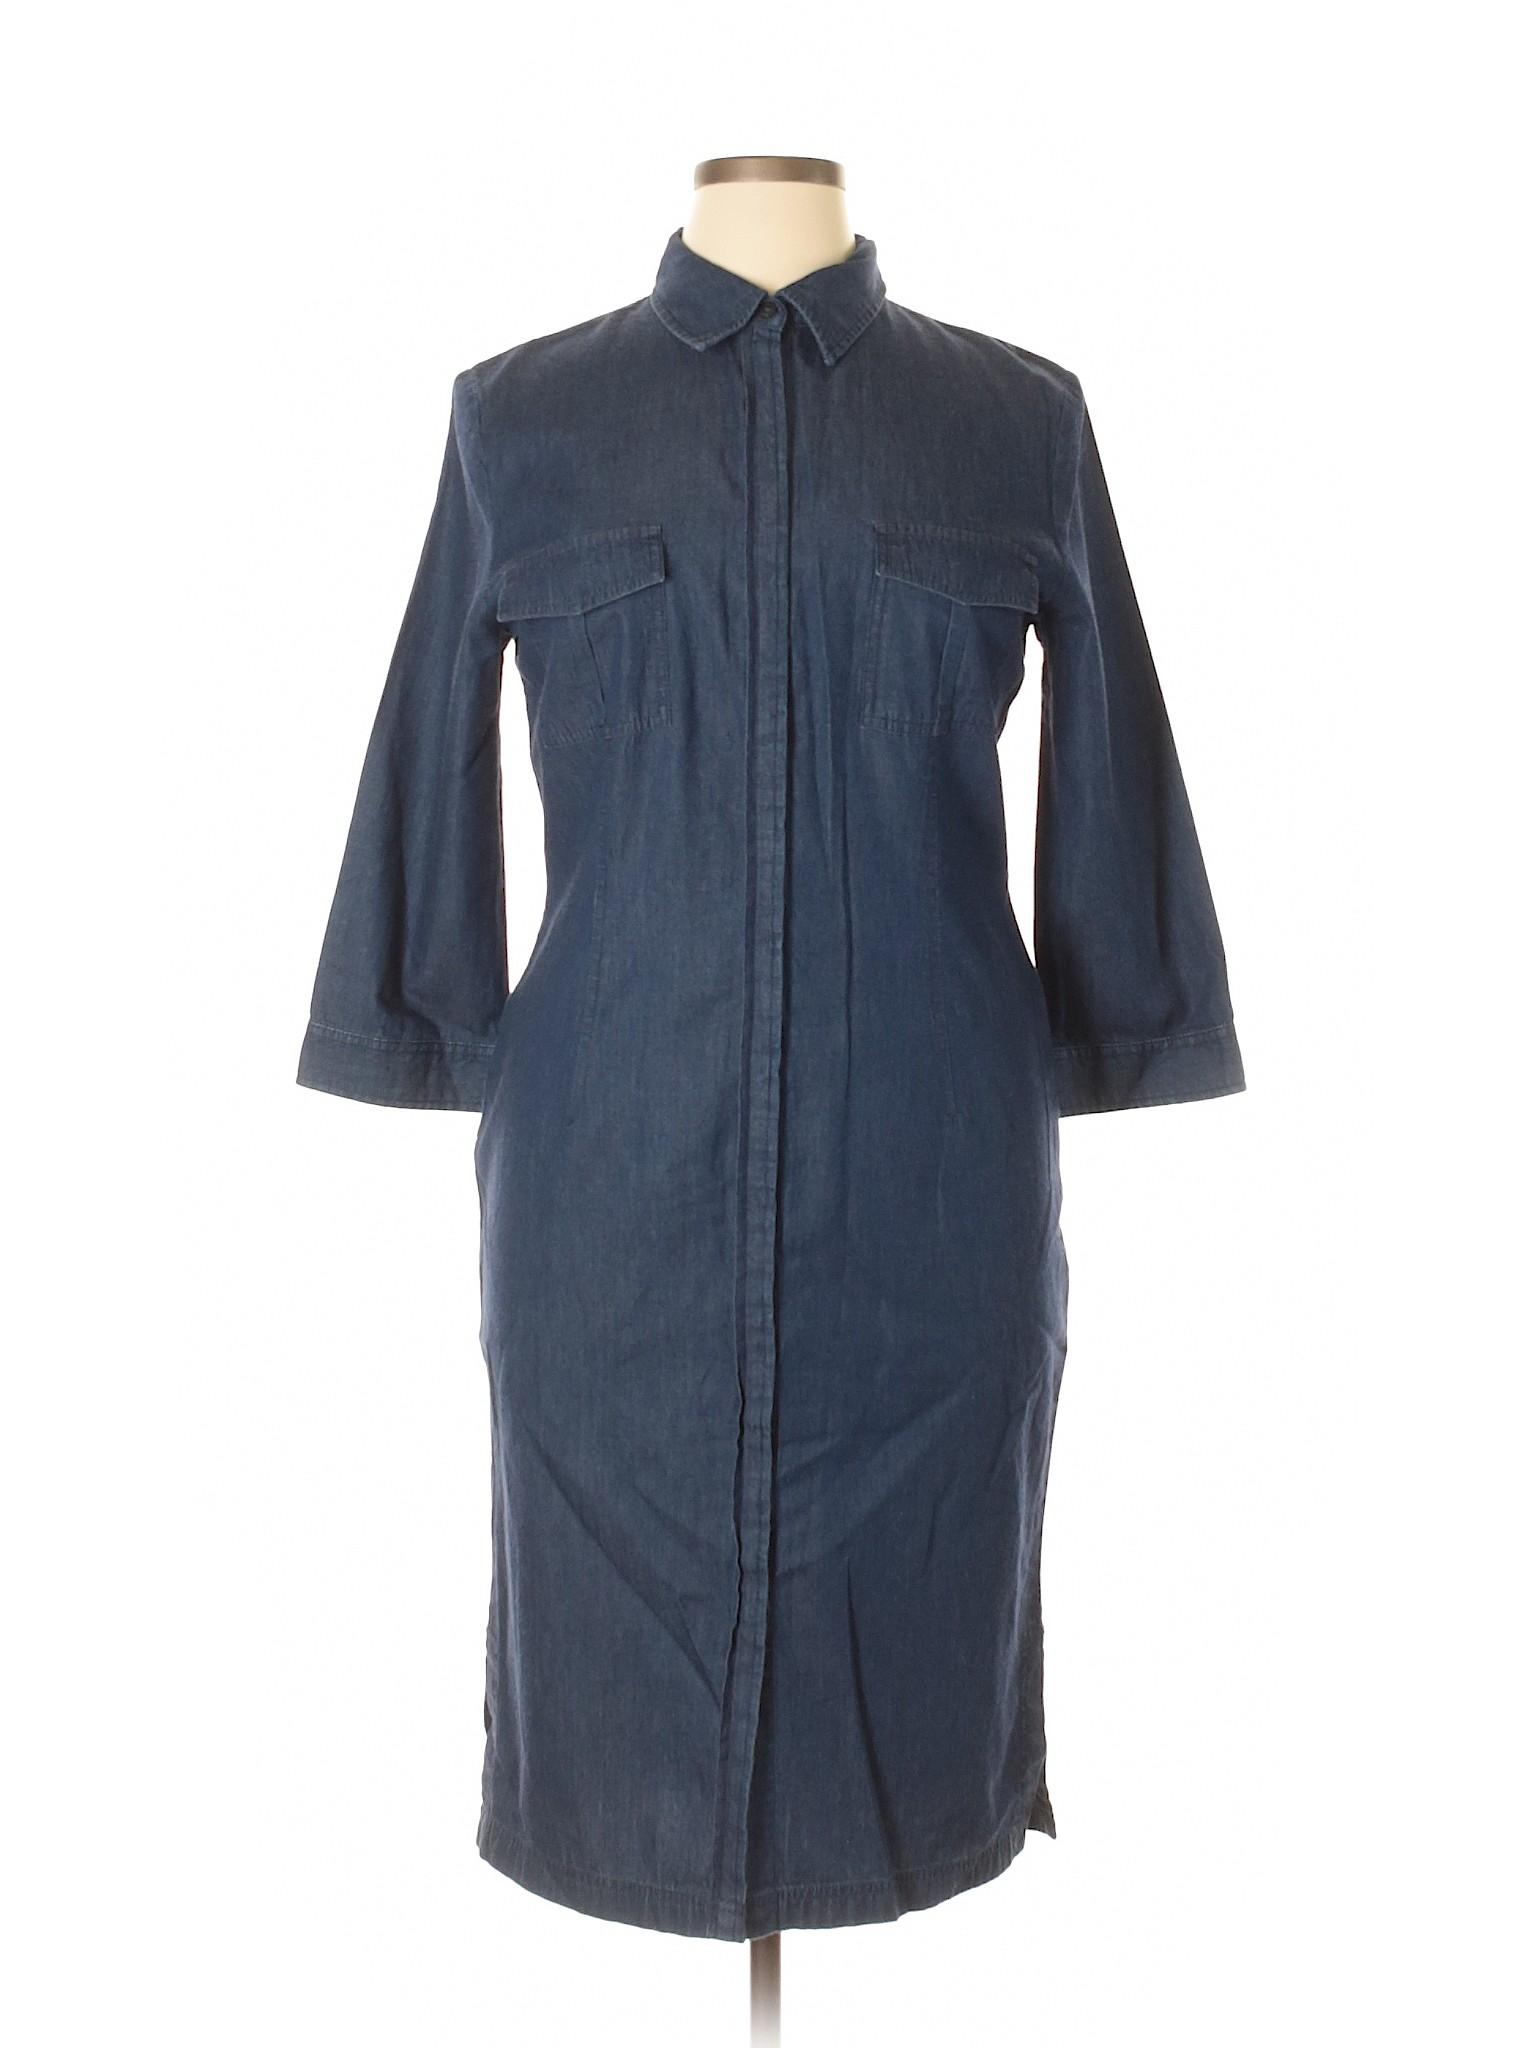 Taylor winter Ann LOFT Casual Boutique Dress 4EFqddB